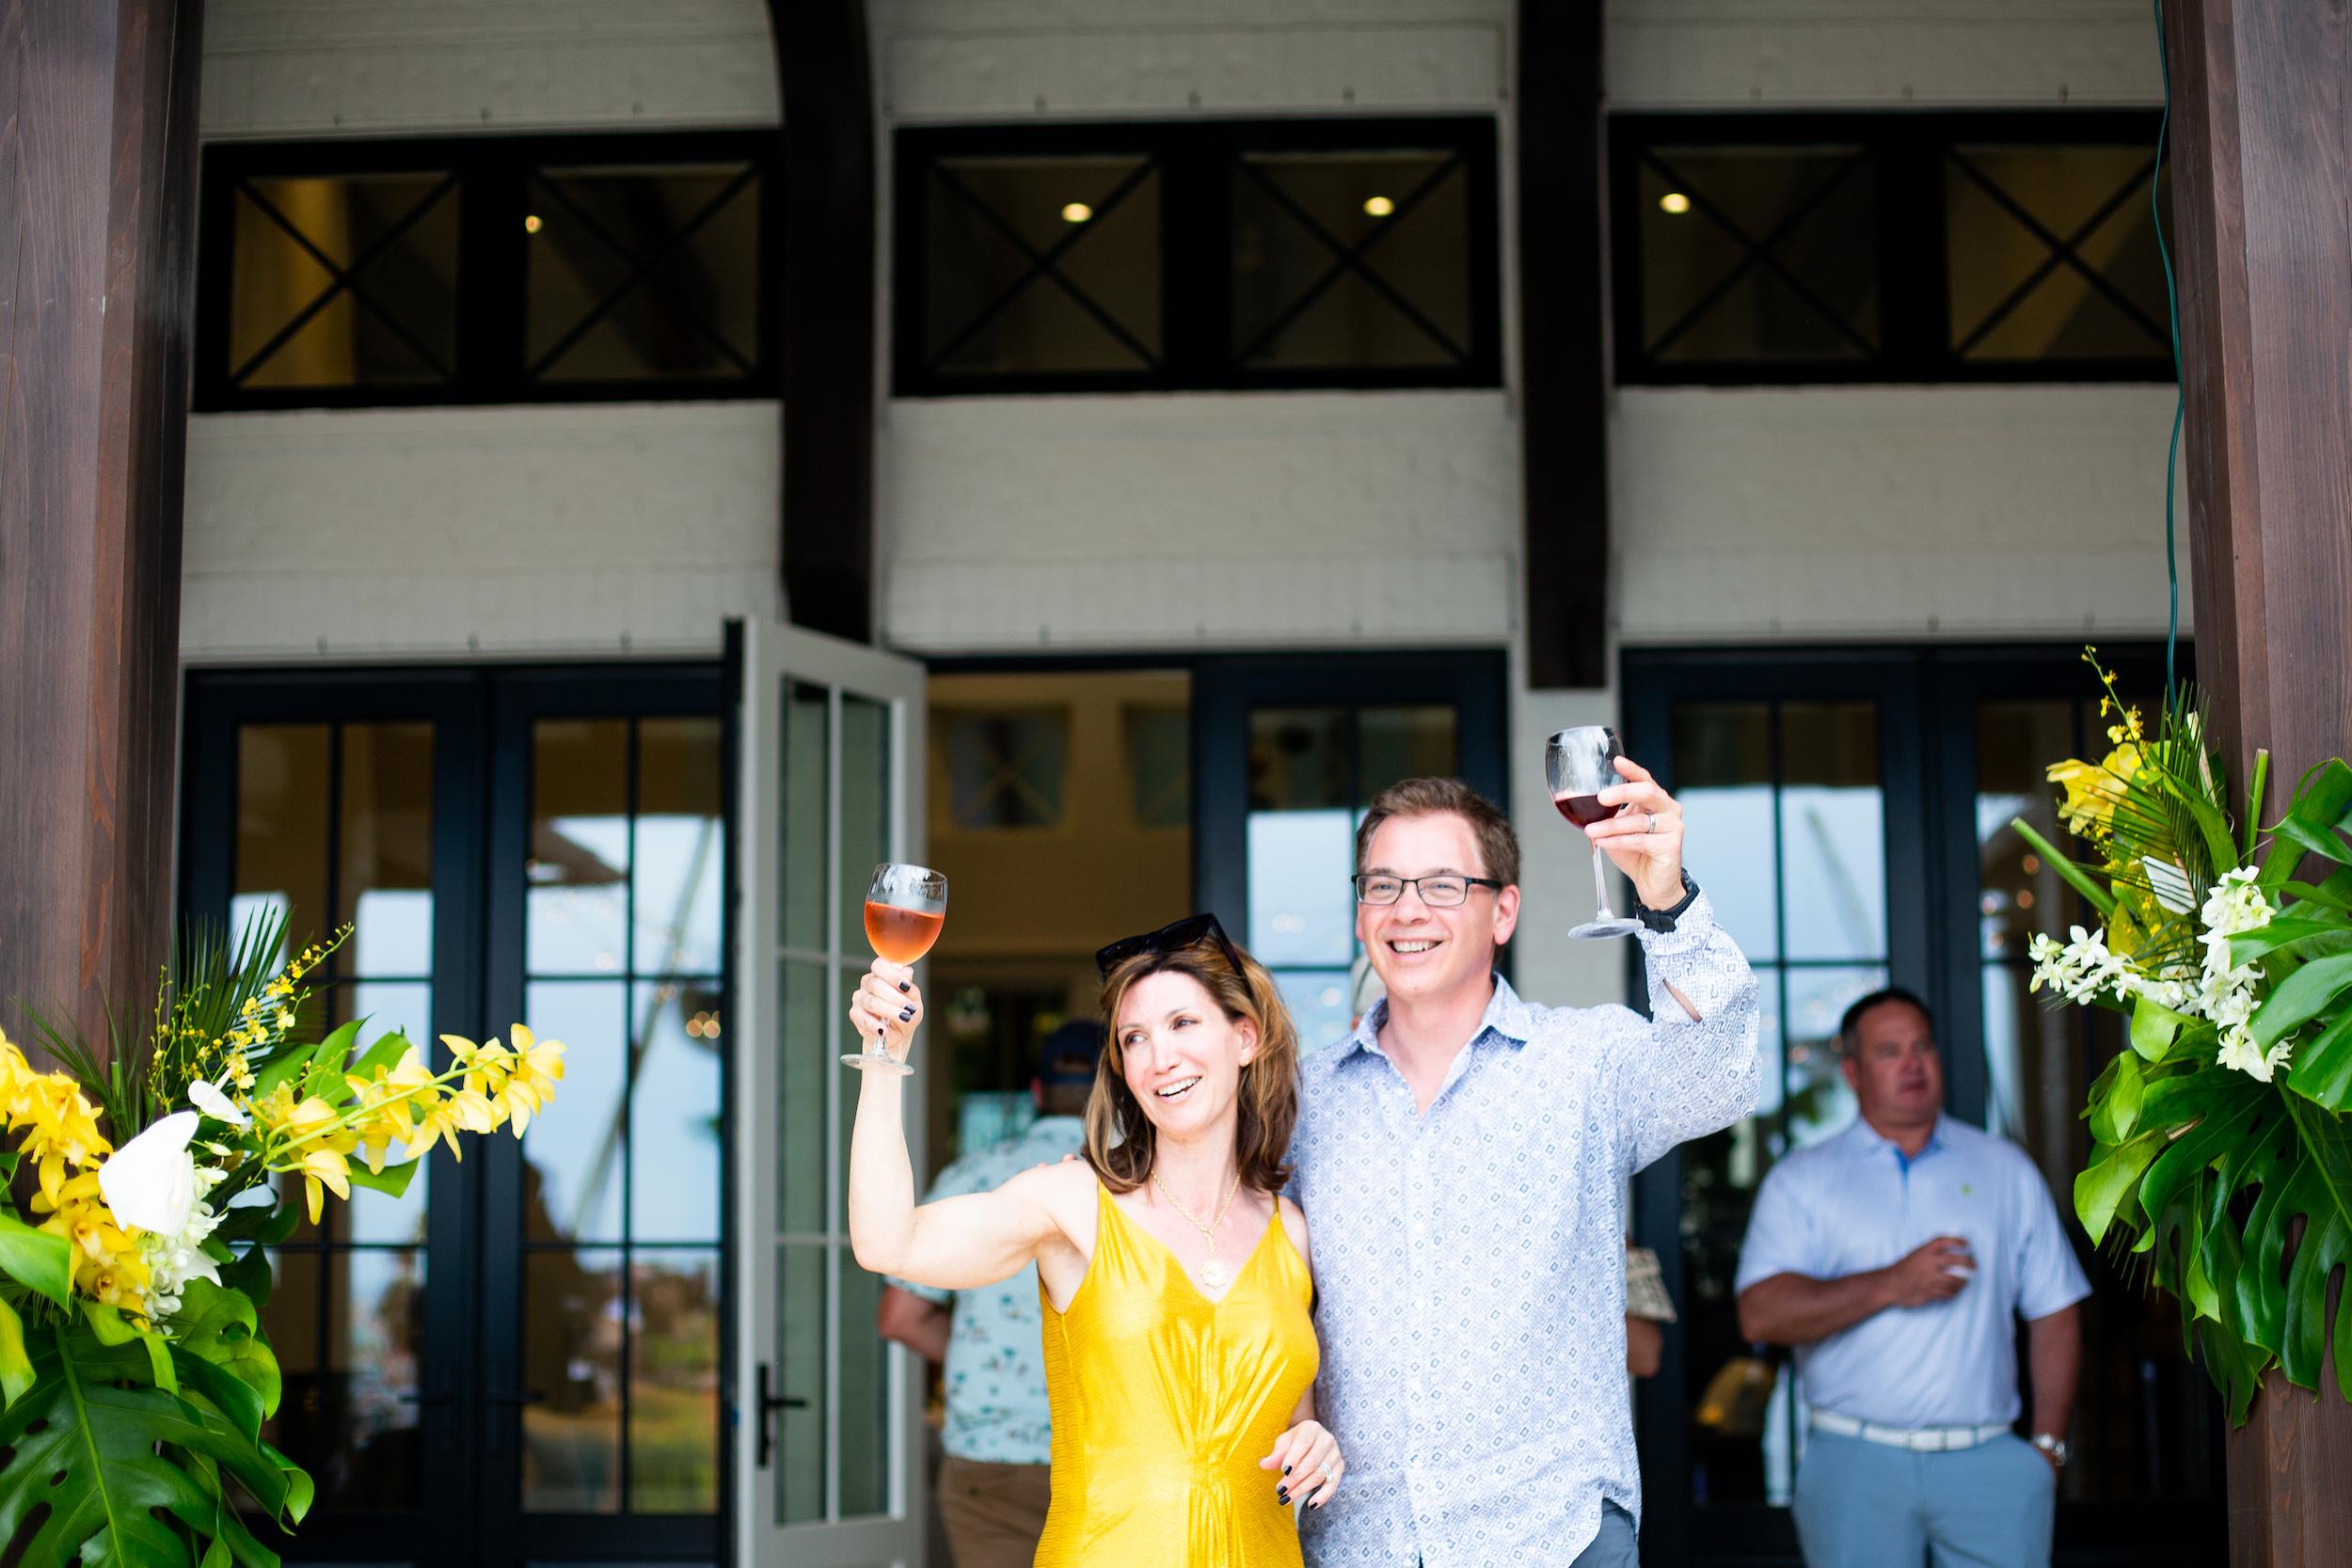 Loretta & Michael at event, holding glasses up